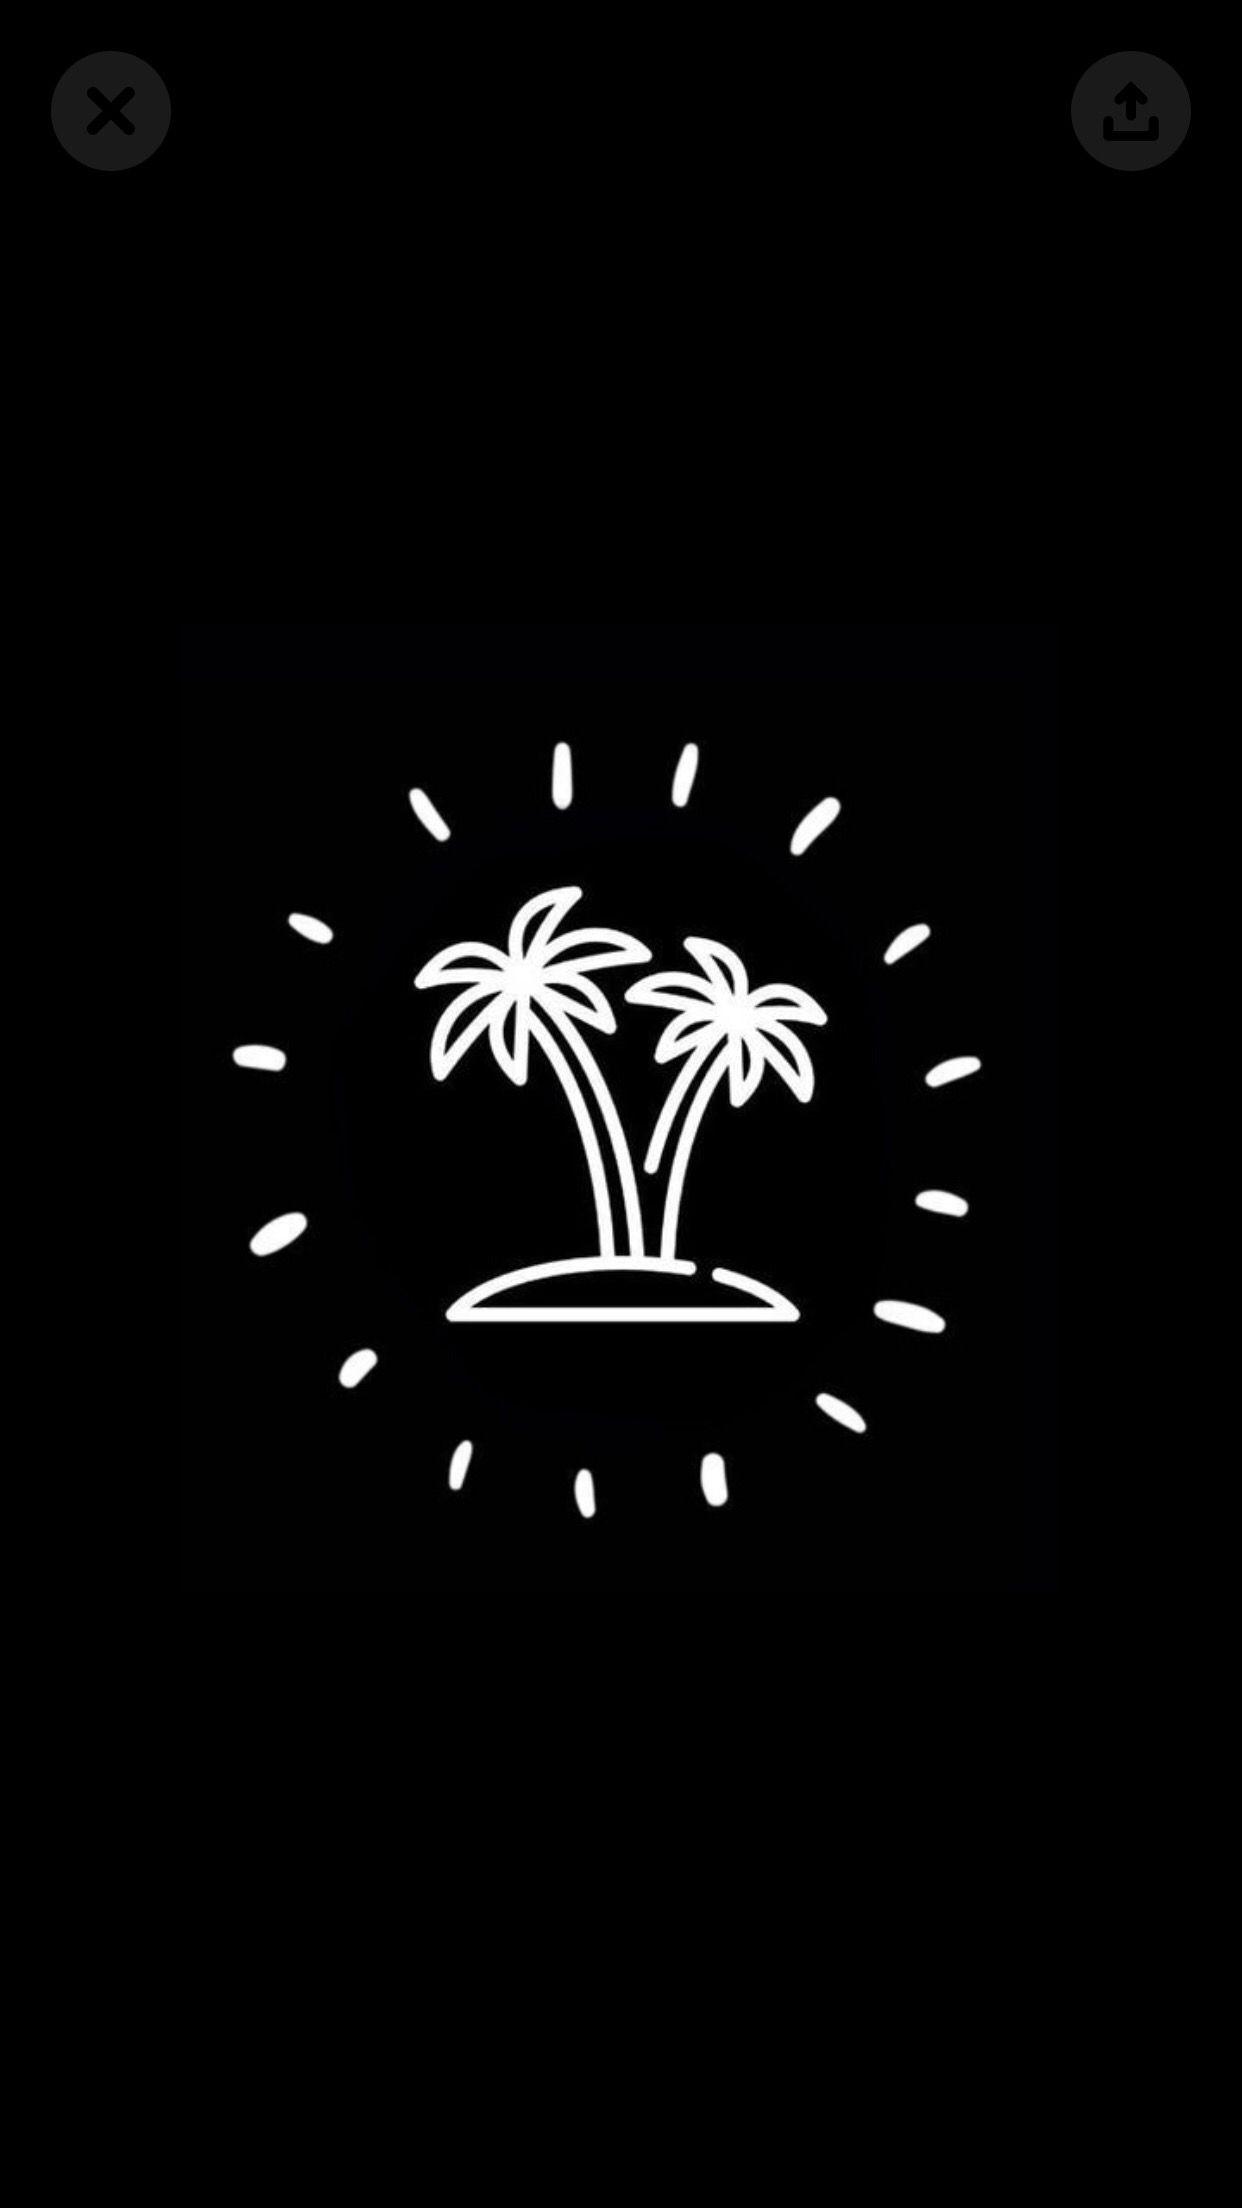 486c2387 Hd Wallpaper Logotipo Instagram Ideias Instagram Icones Do Instagram